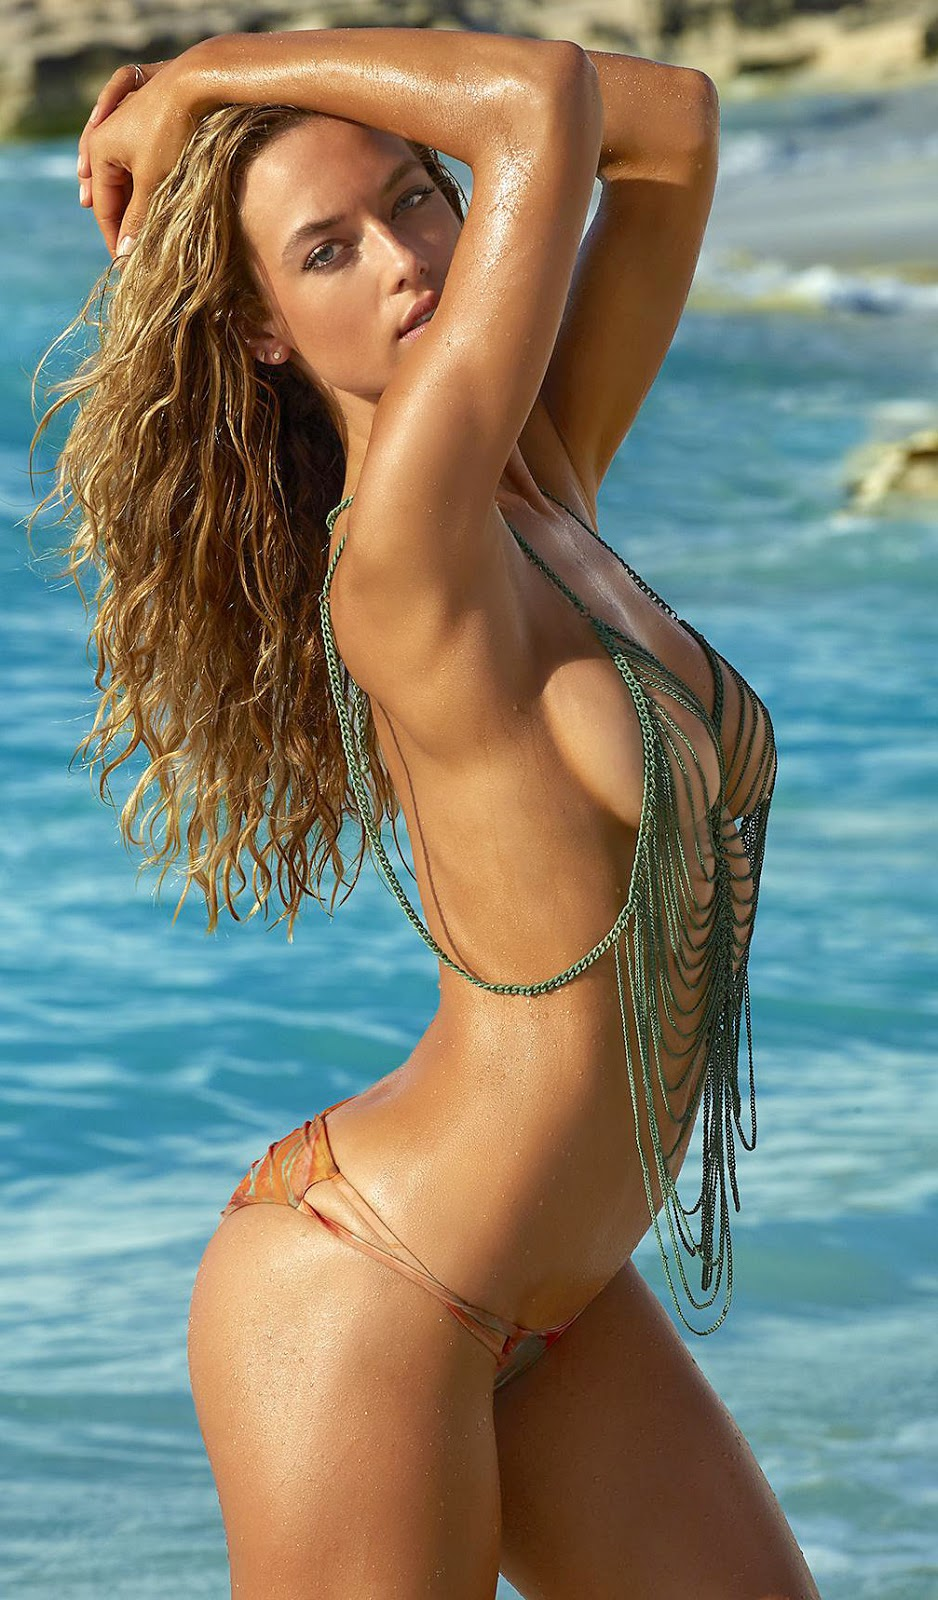 Naked Si Swimsuit Models